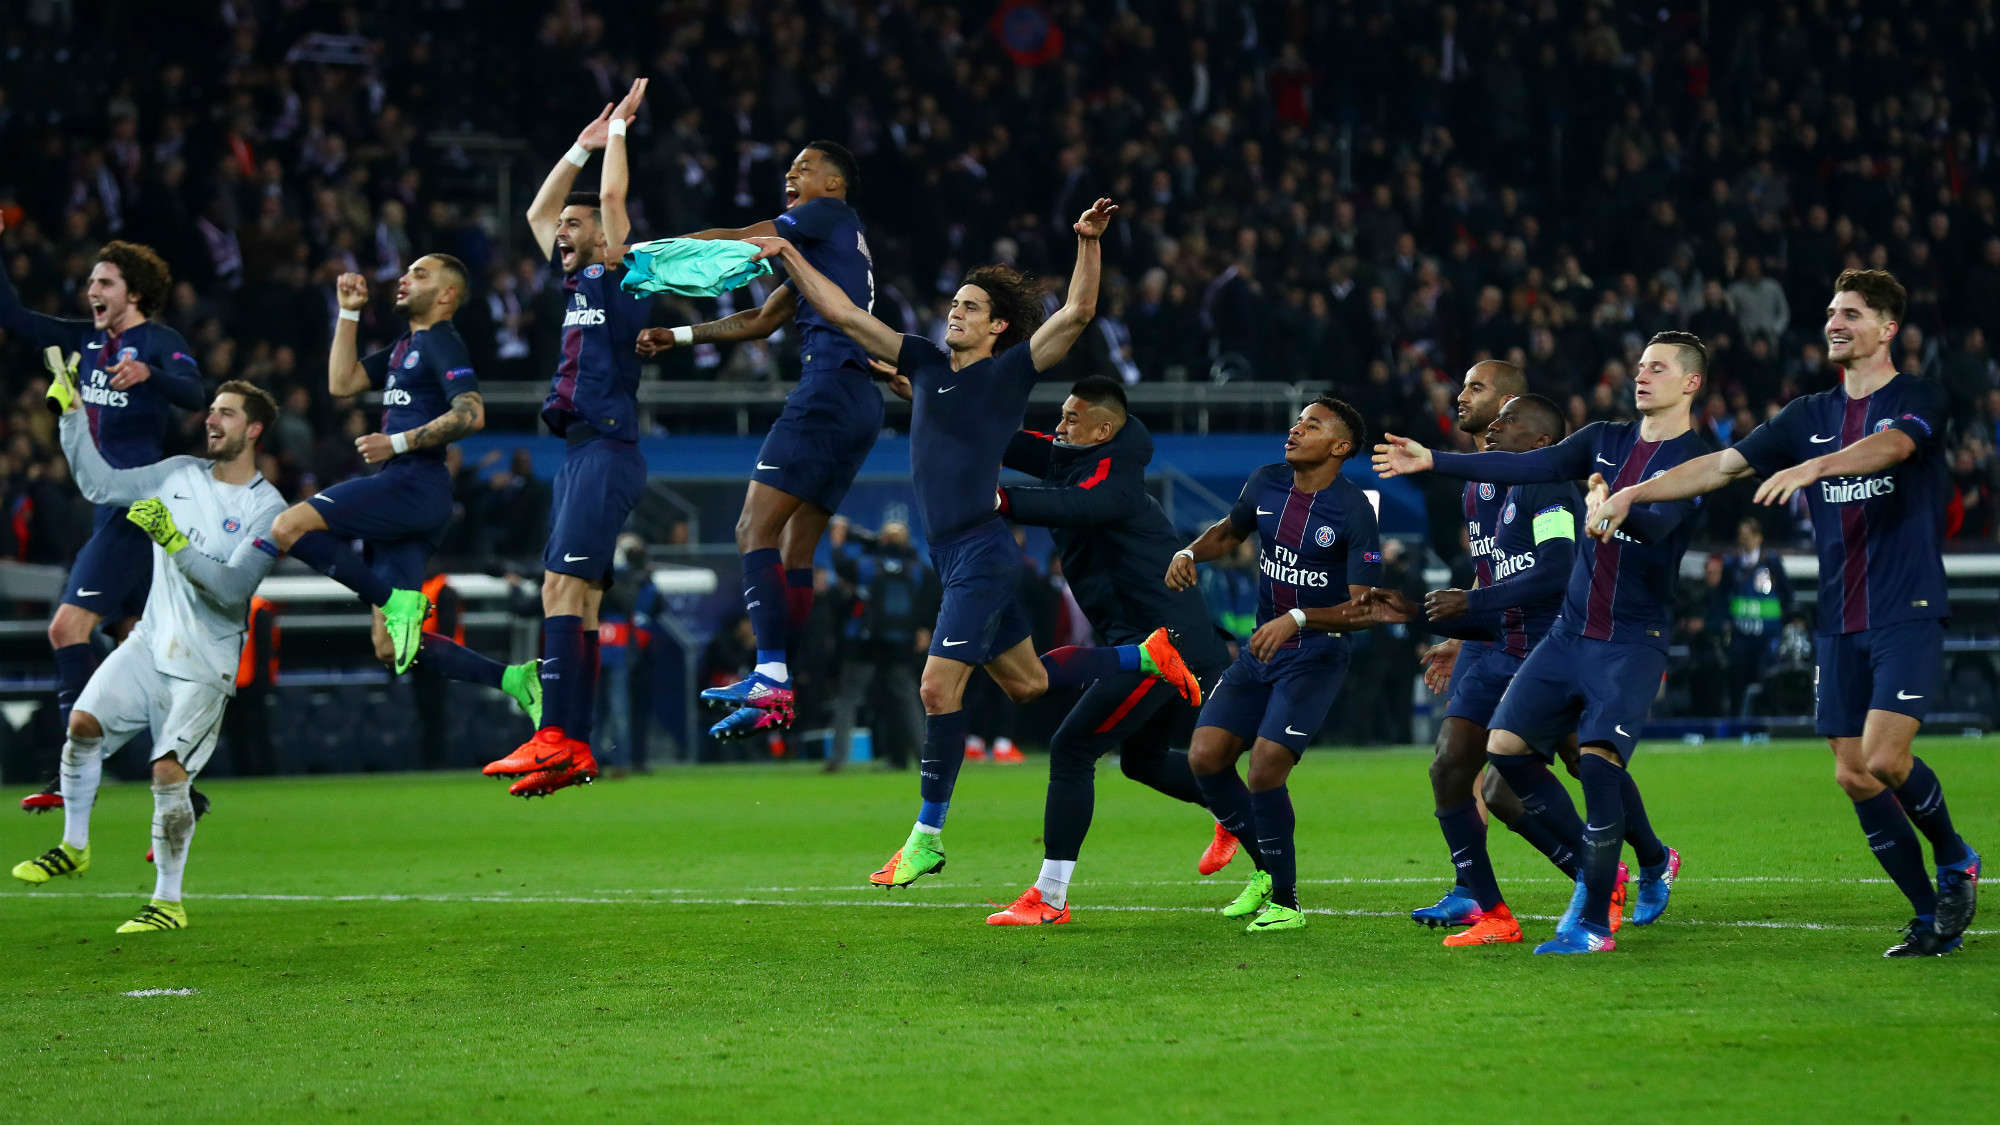 PSG vs Anderlecht đêm nay 1/11/2017 Champions League